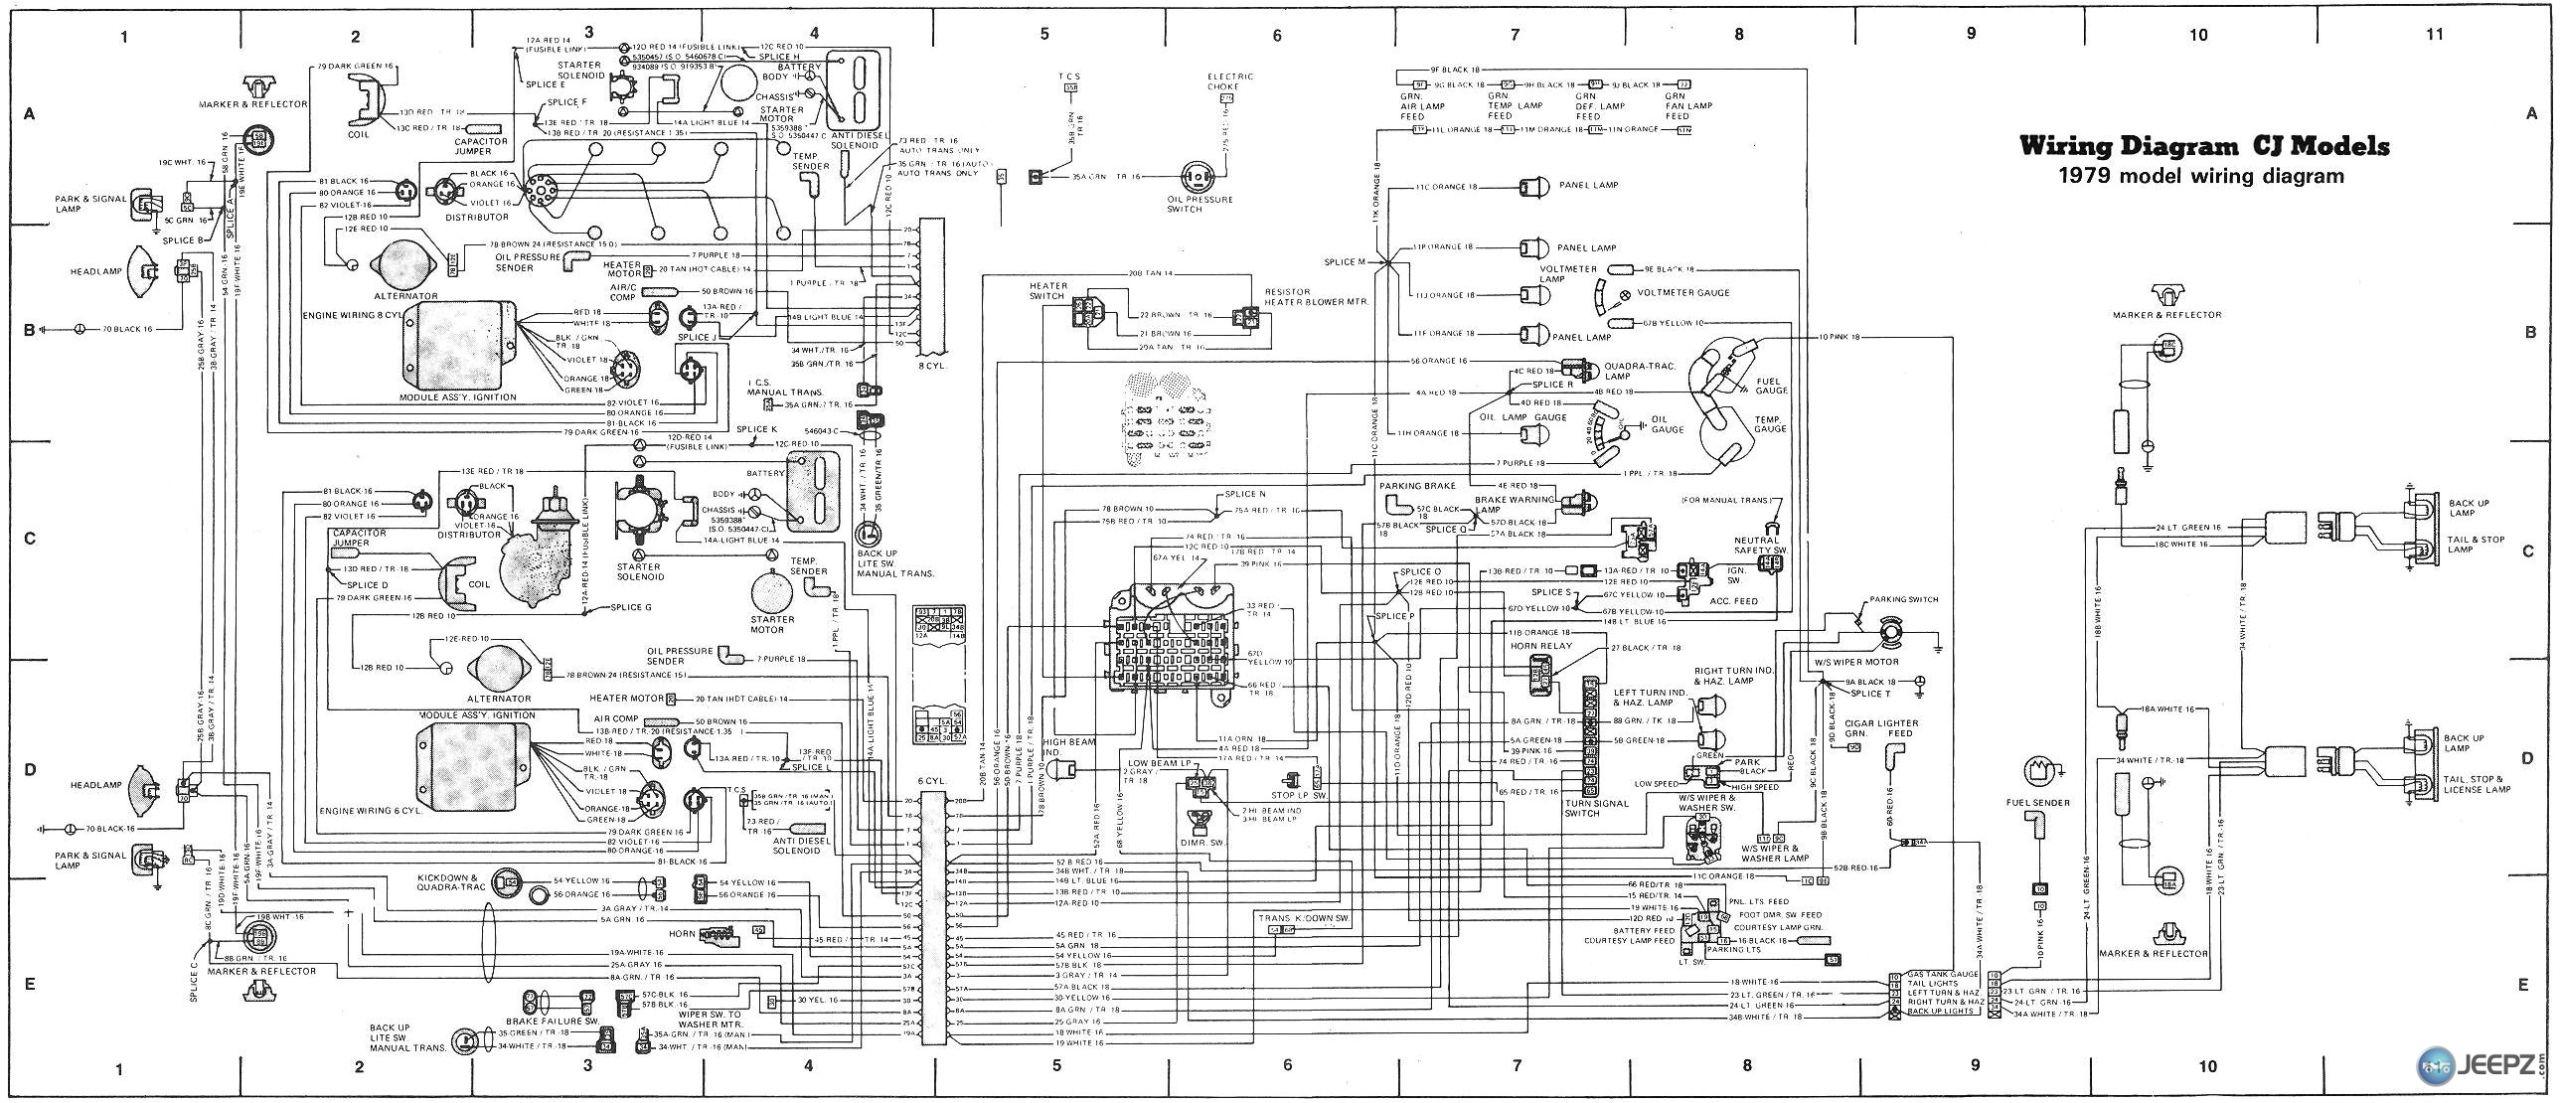 2662d1242186853 cj5 wiring diagram cj wiring diagram 1979 jpg